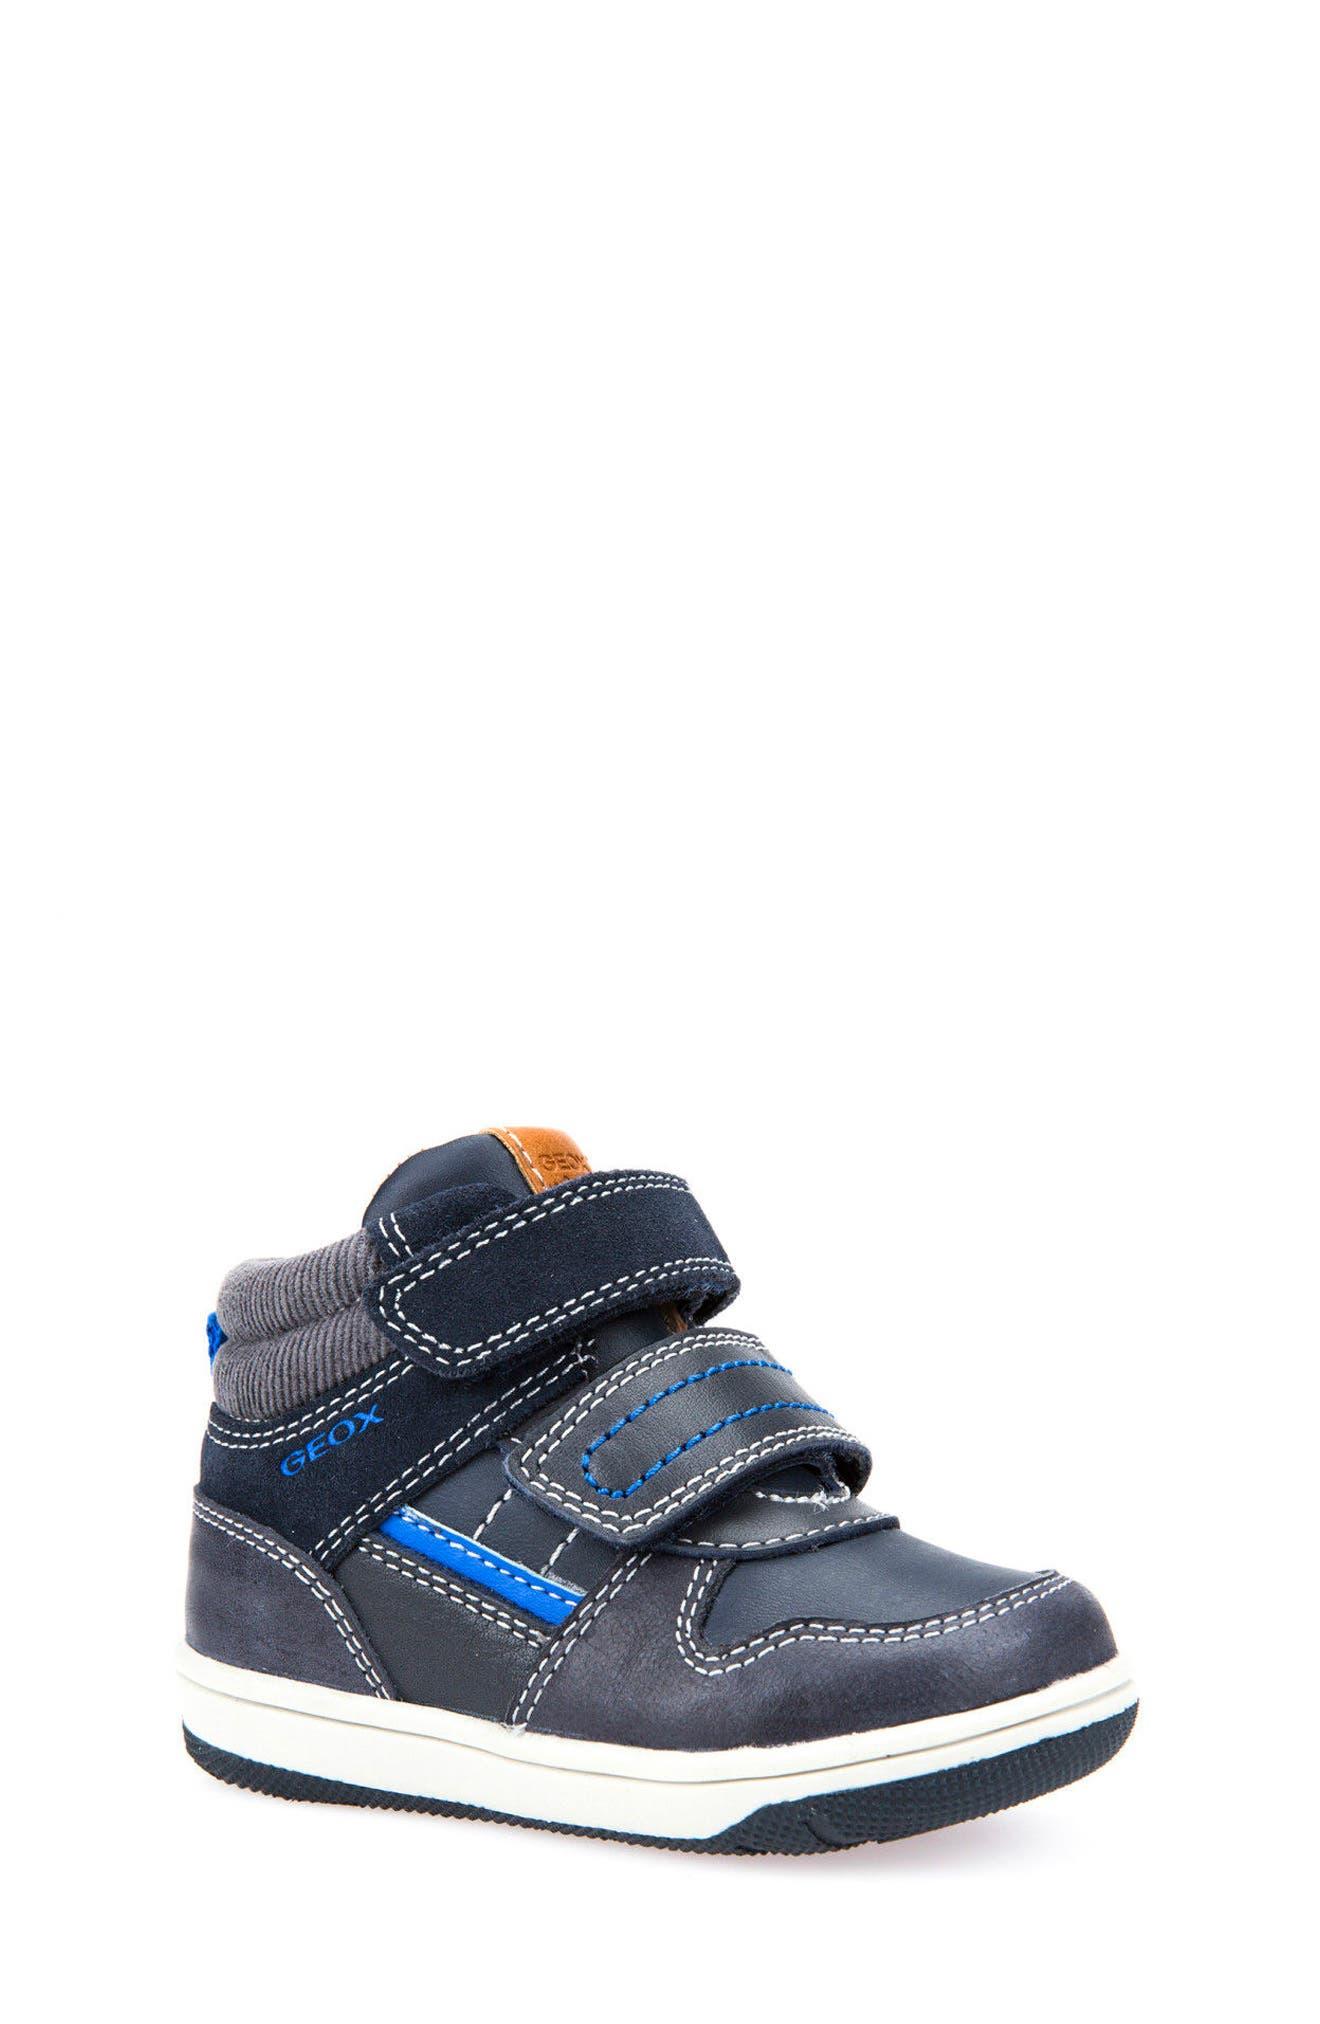 New Flick Mid Top Sneaker,                         Main,                         color, 002